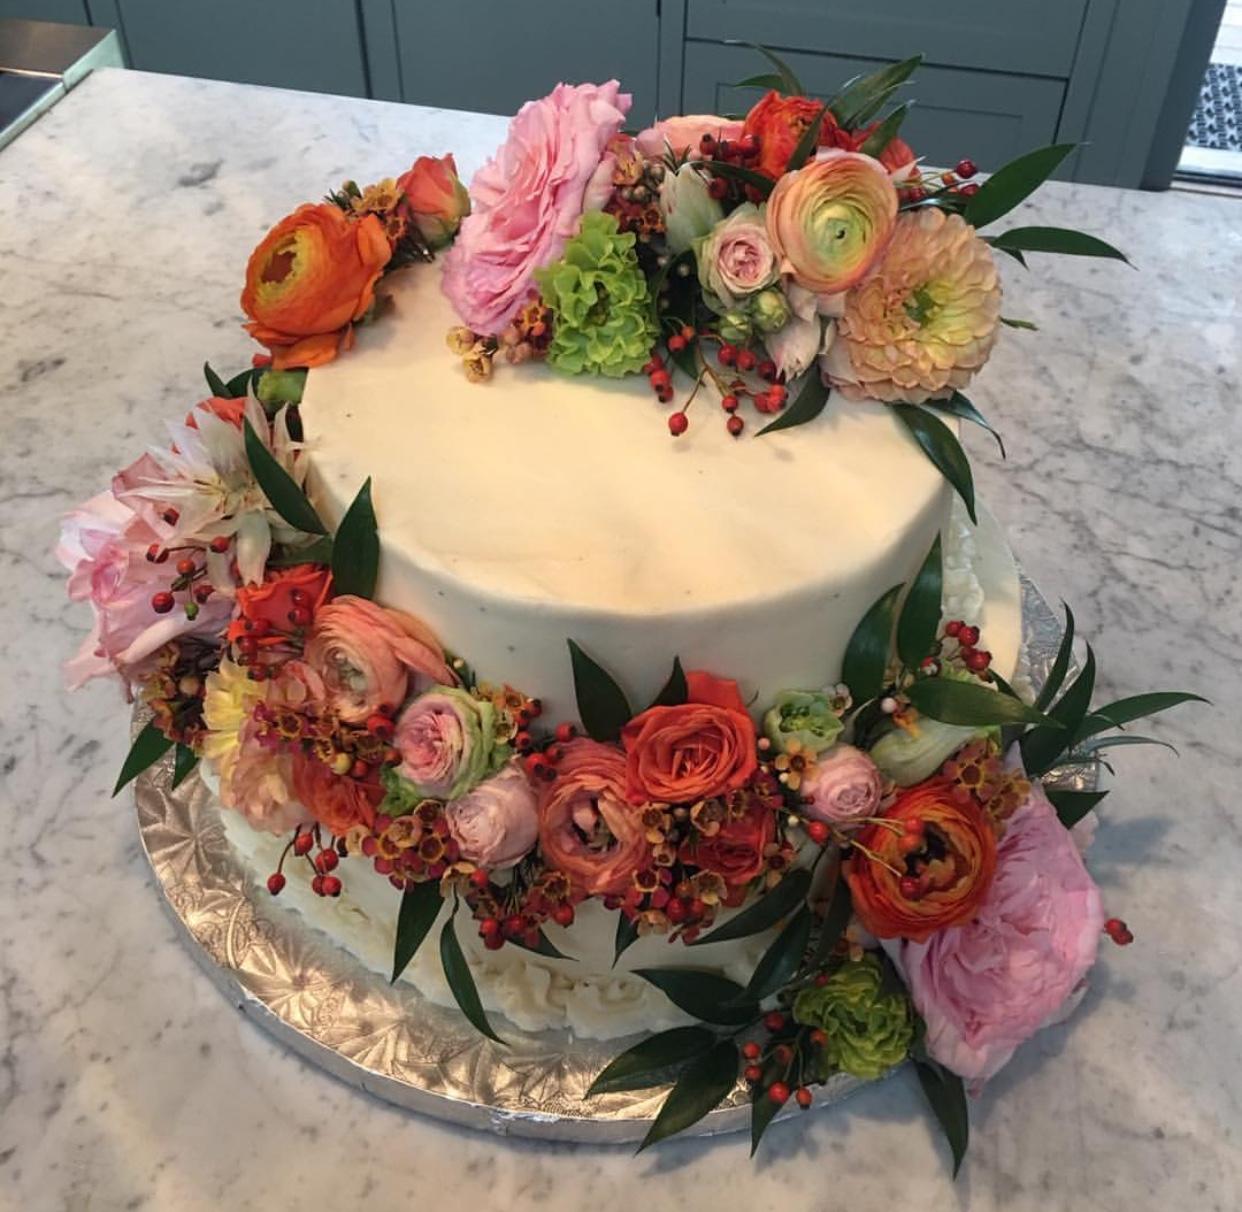 44. Floral Cake Decor